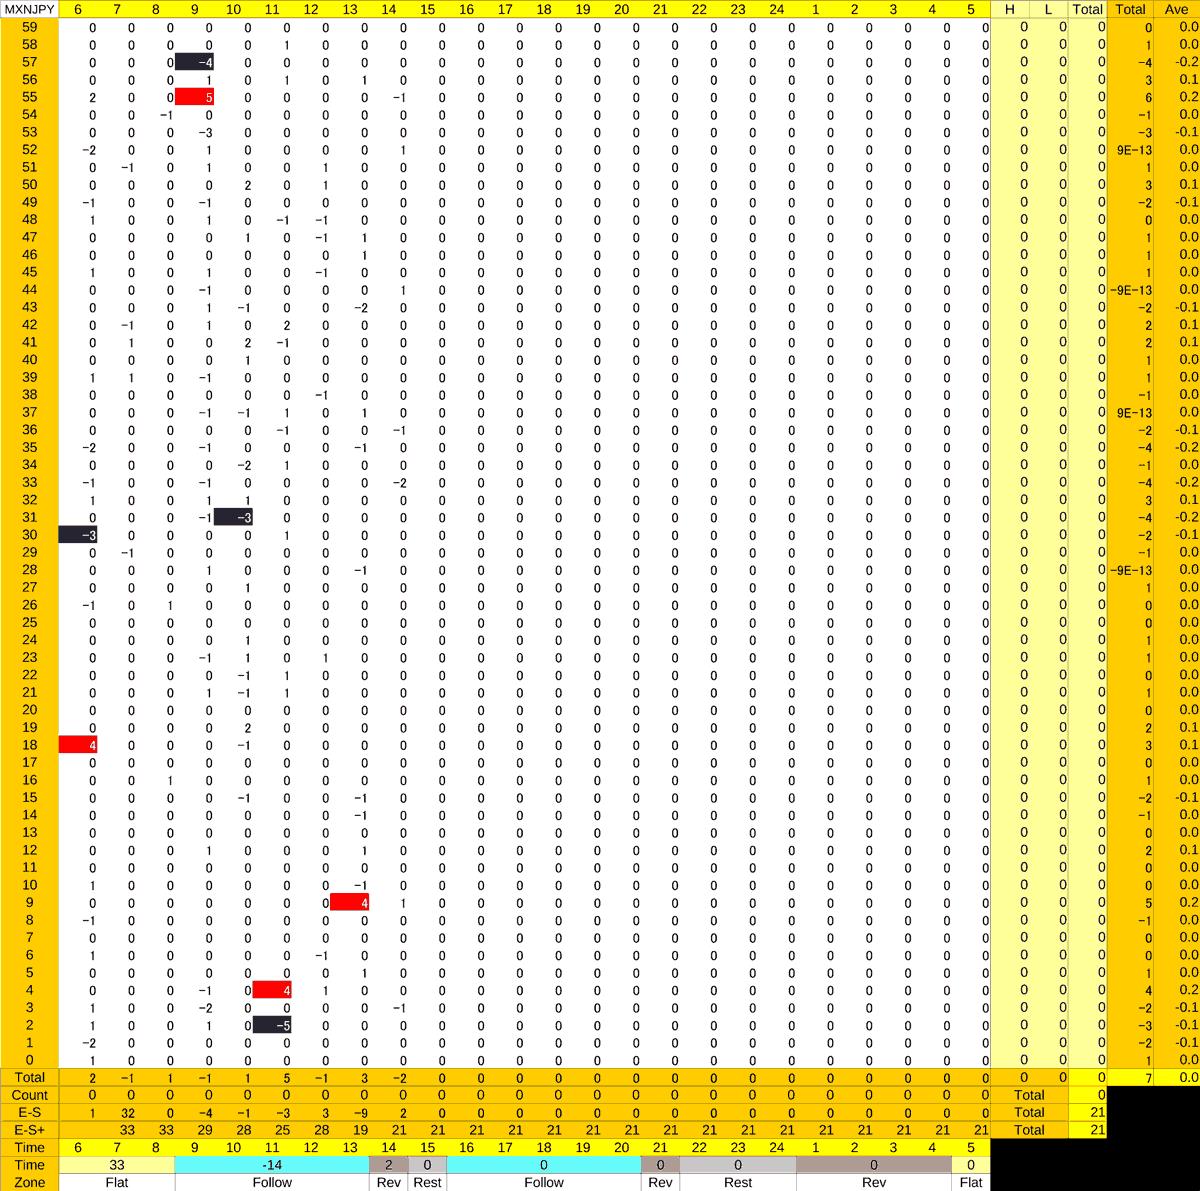 20201225_HS(3)MXNJPY